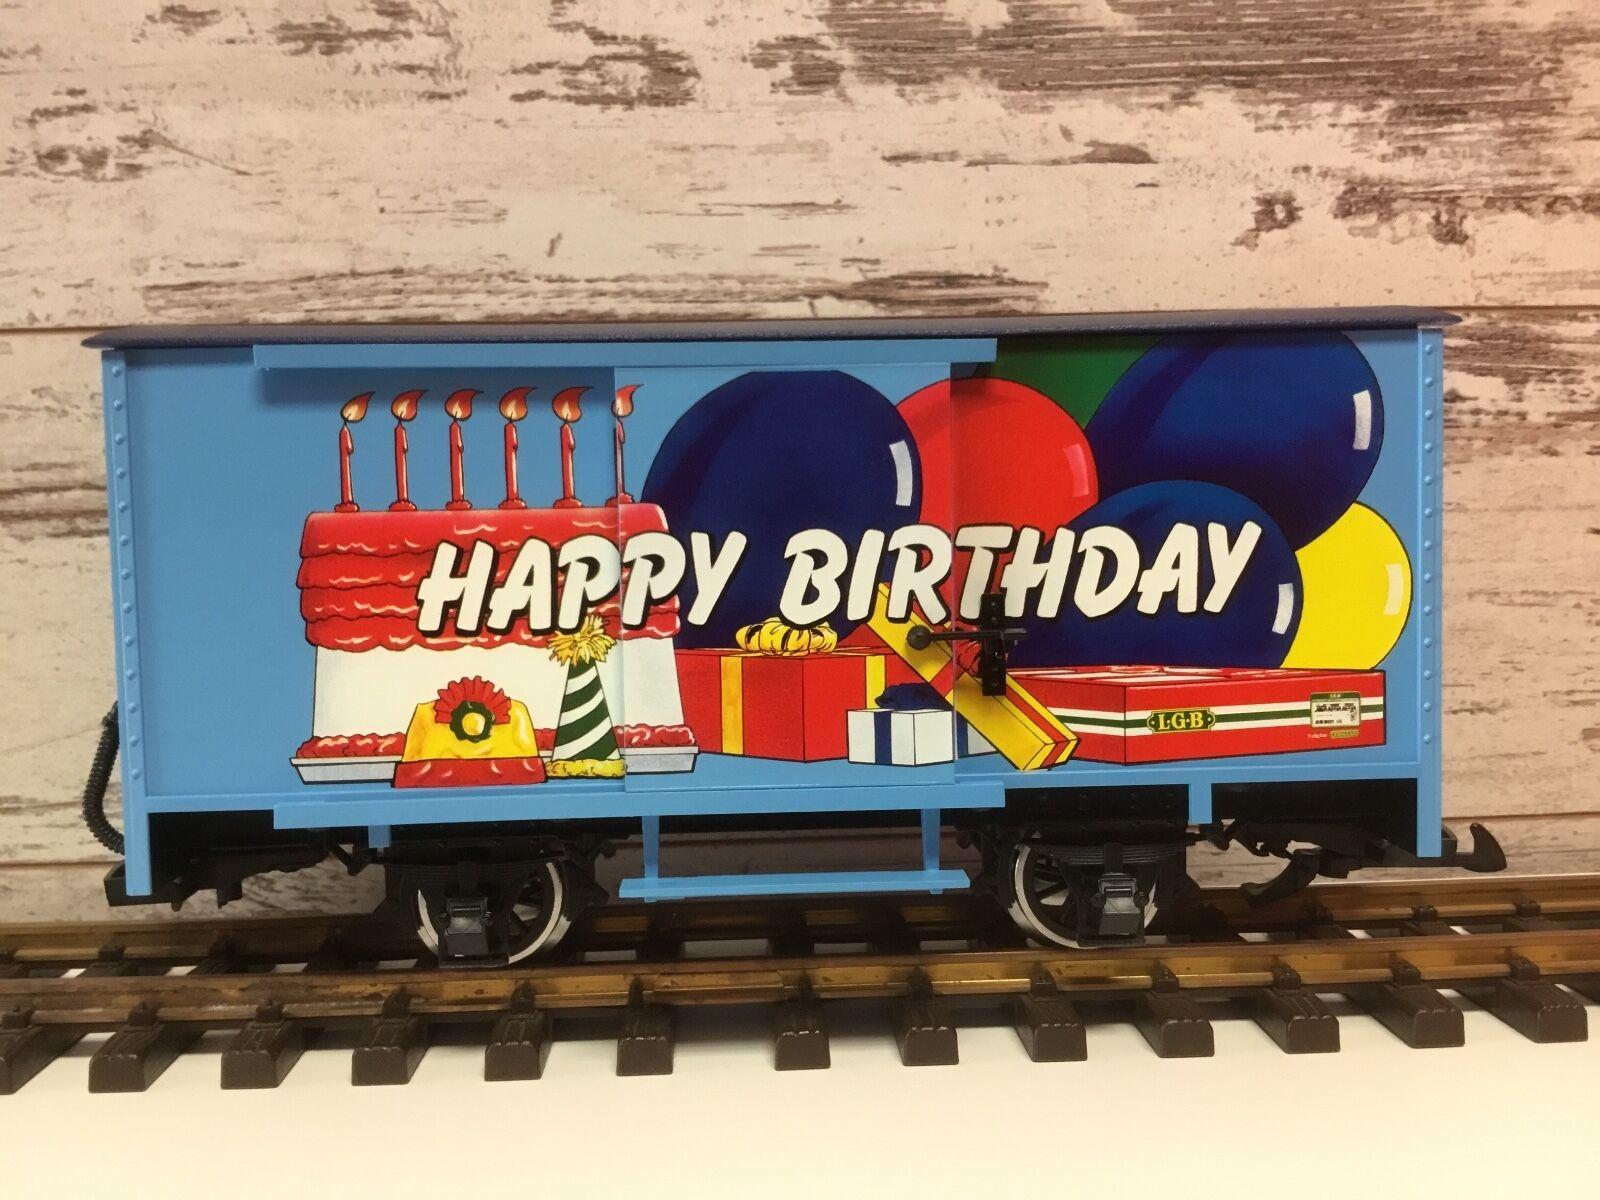 LGB 4435 HB HAPPY BIRTHDAY TO YOU MUSICAL BOX CAR - G SCALE